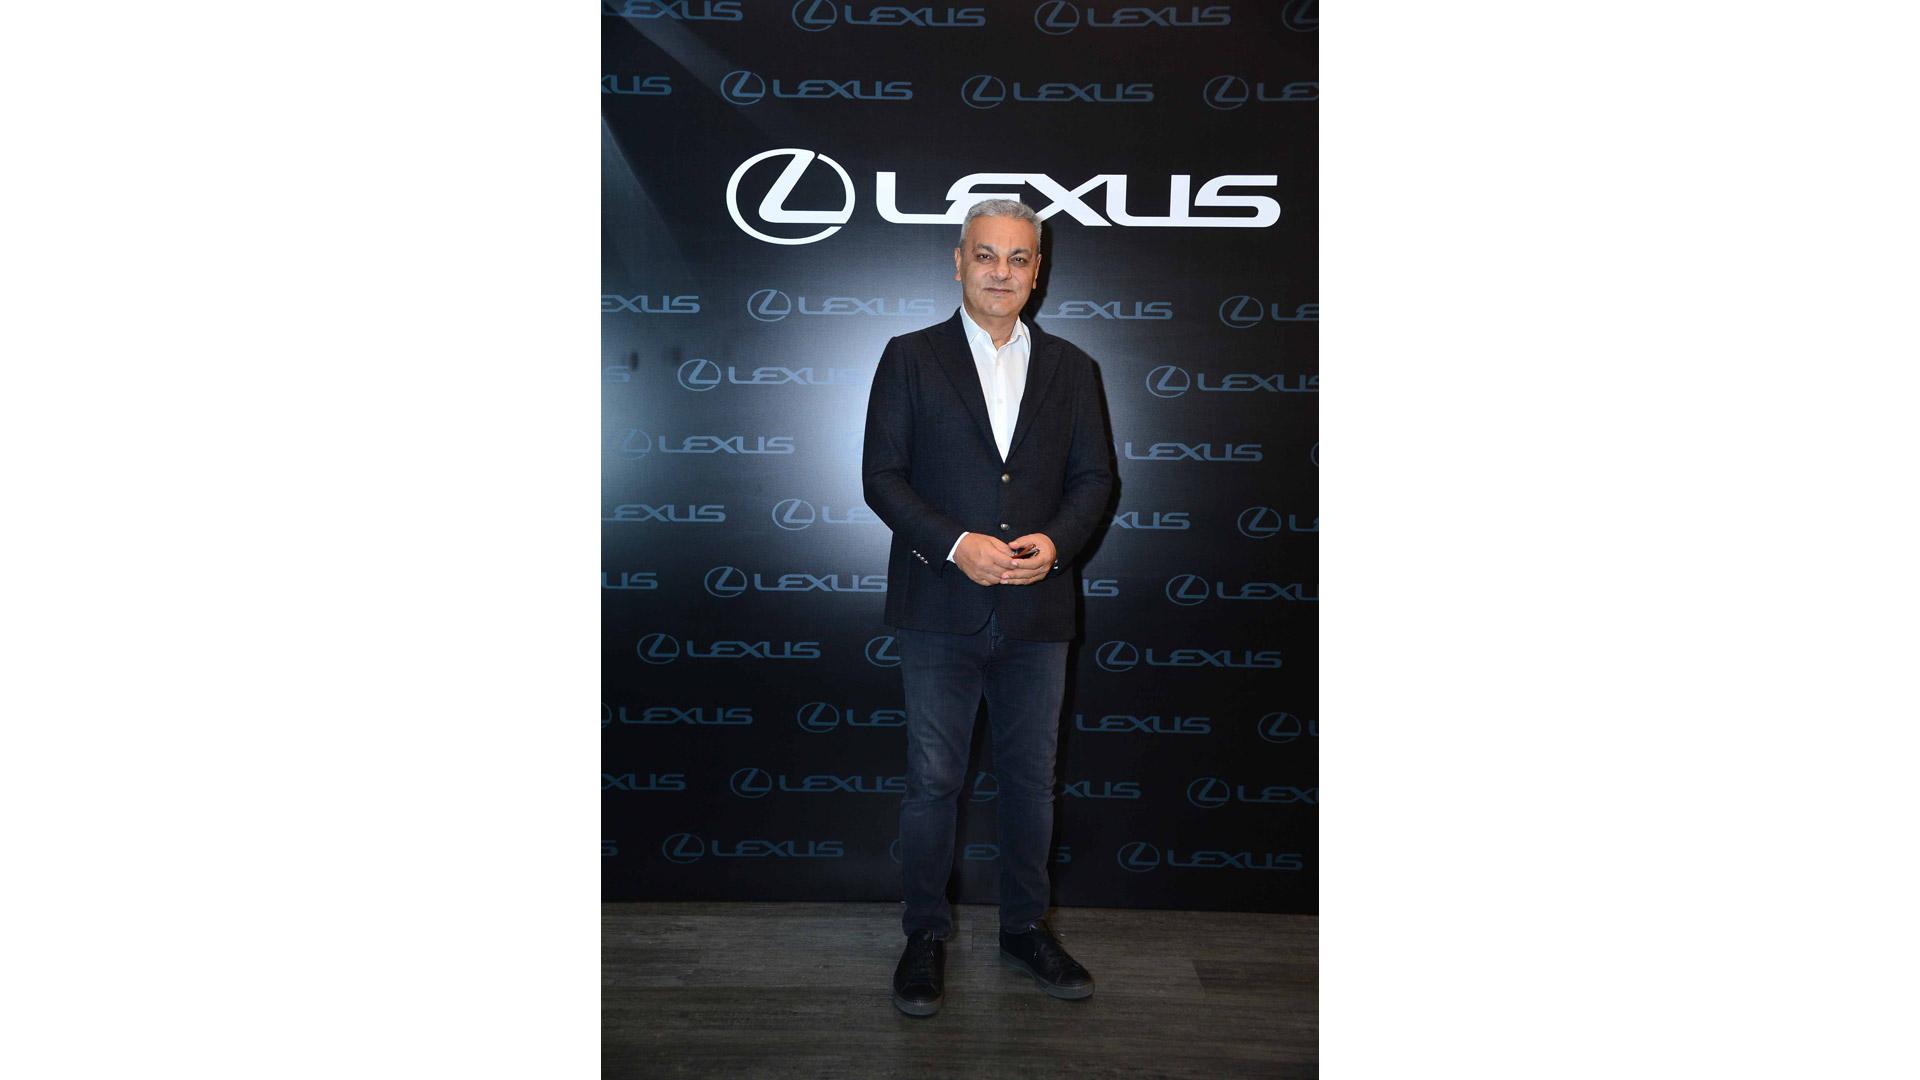 Lexus Fotograf Sergisi gallery04